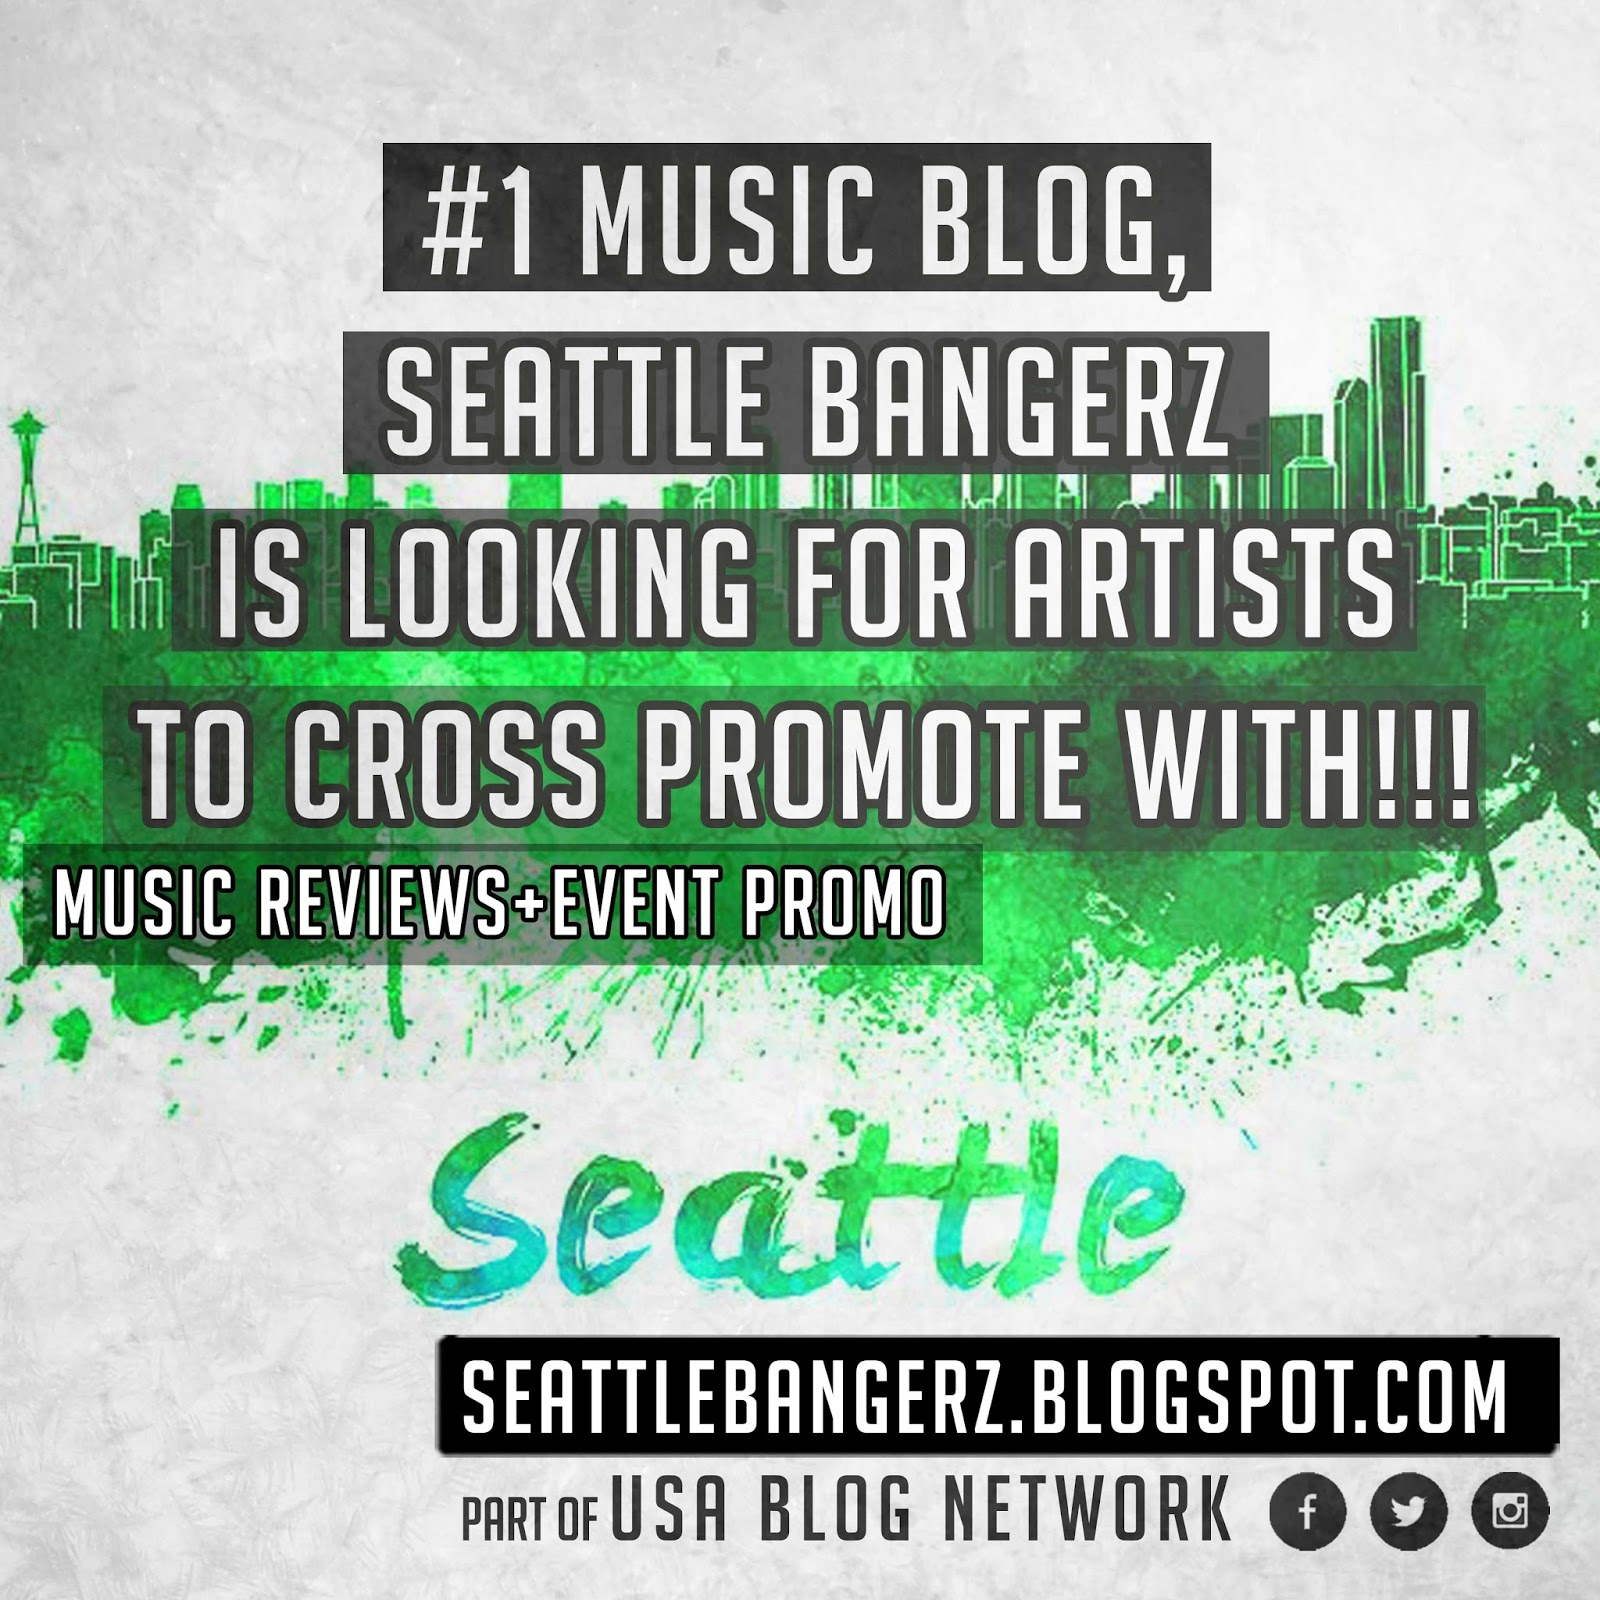 Seattle Bangerz cross promotion opportunities for artists